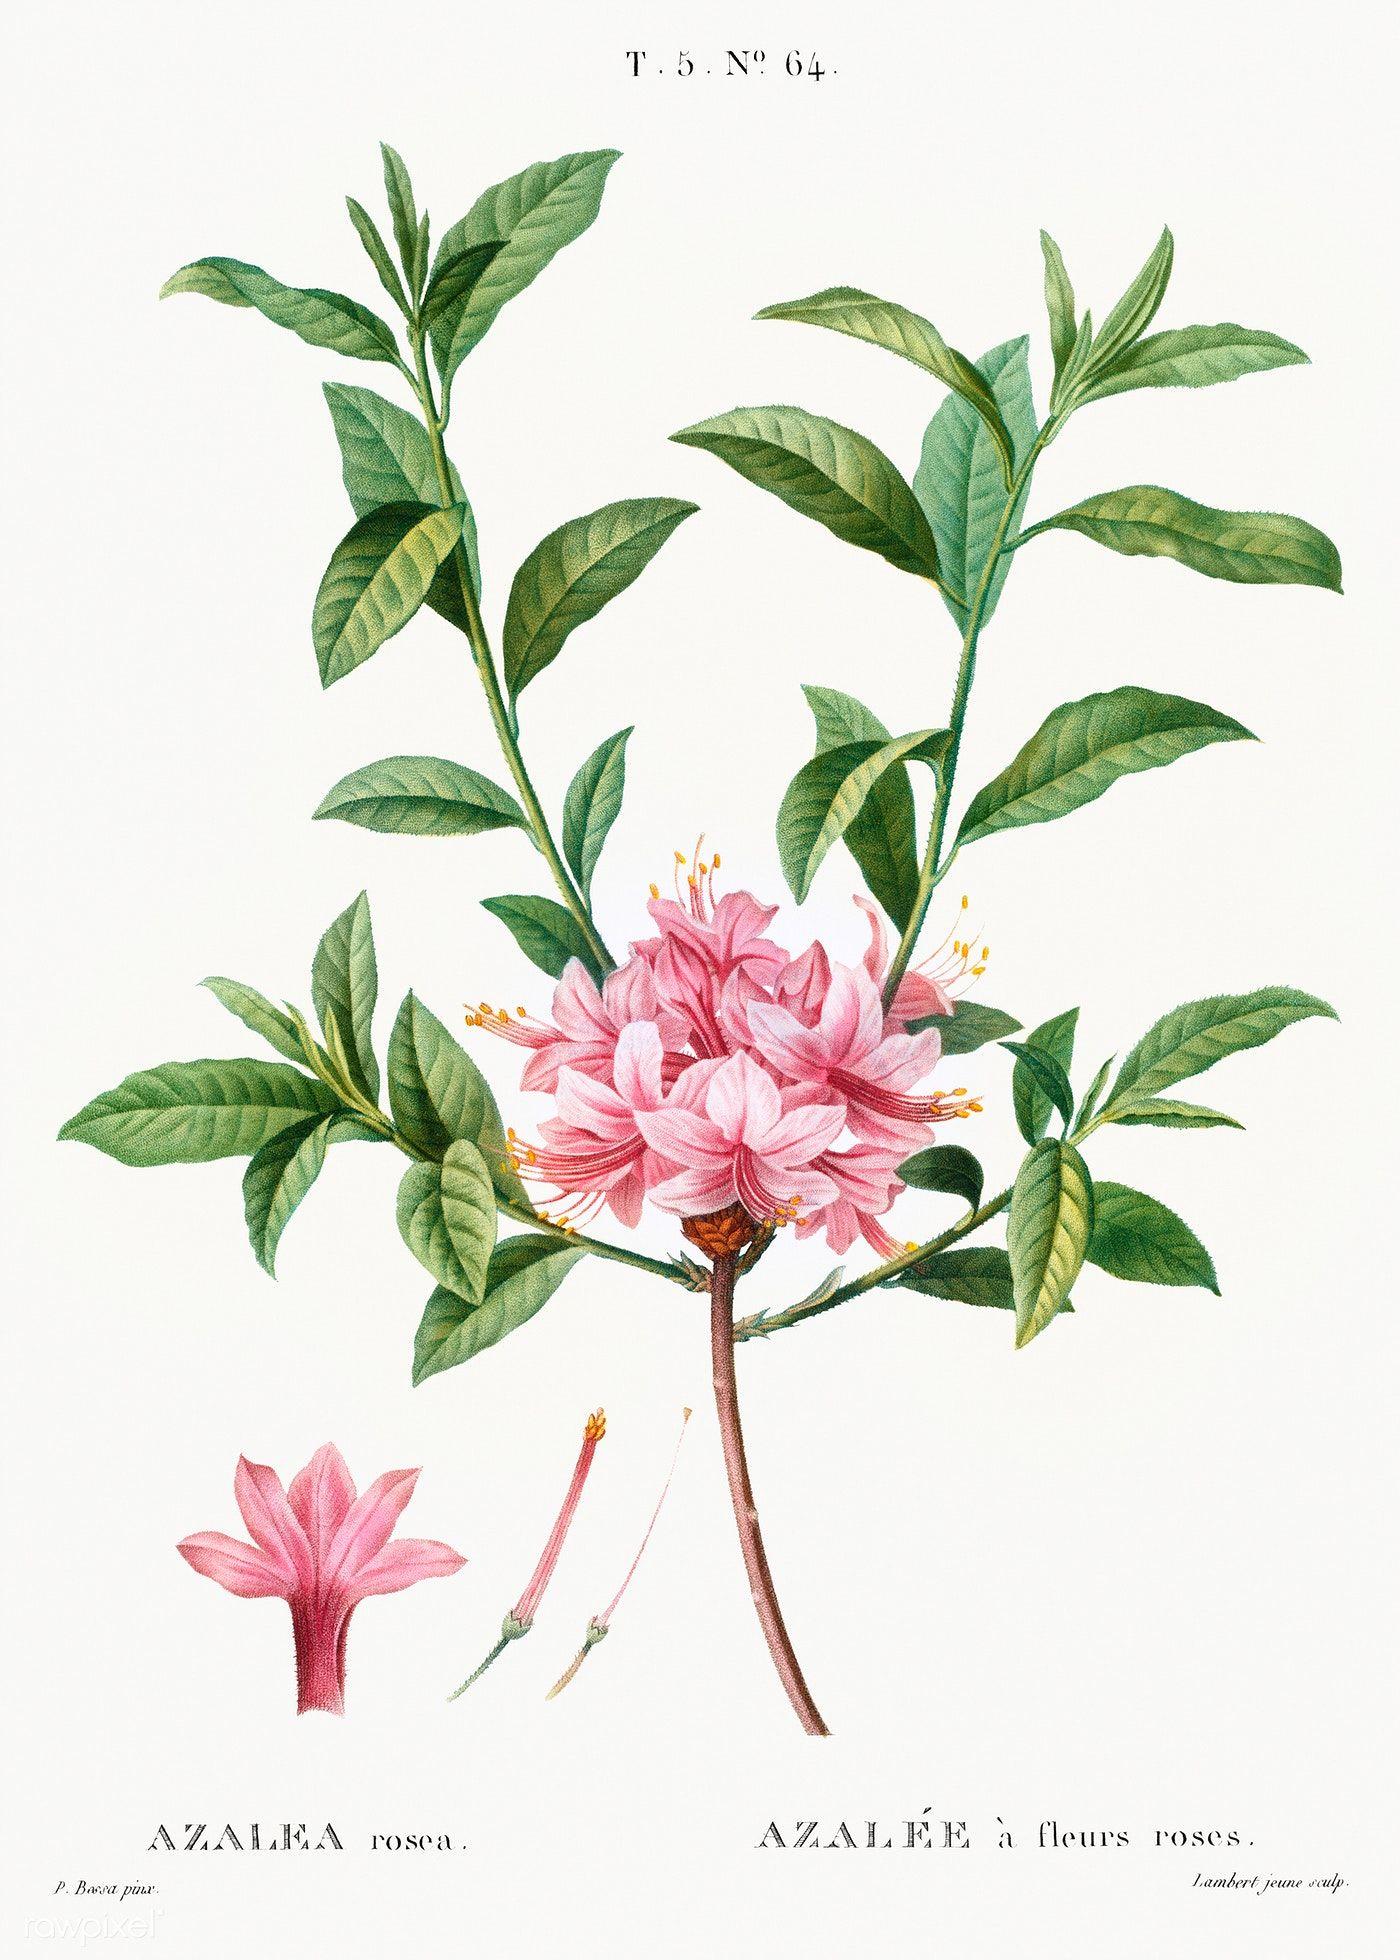 Azalea Azalea Rosea From Traite Des Arbres Et Arbustes Que L On Cultive En France En Pl Flower Illustration Vintage Floral Backgrounds Botanical Illustration